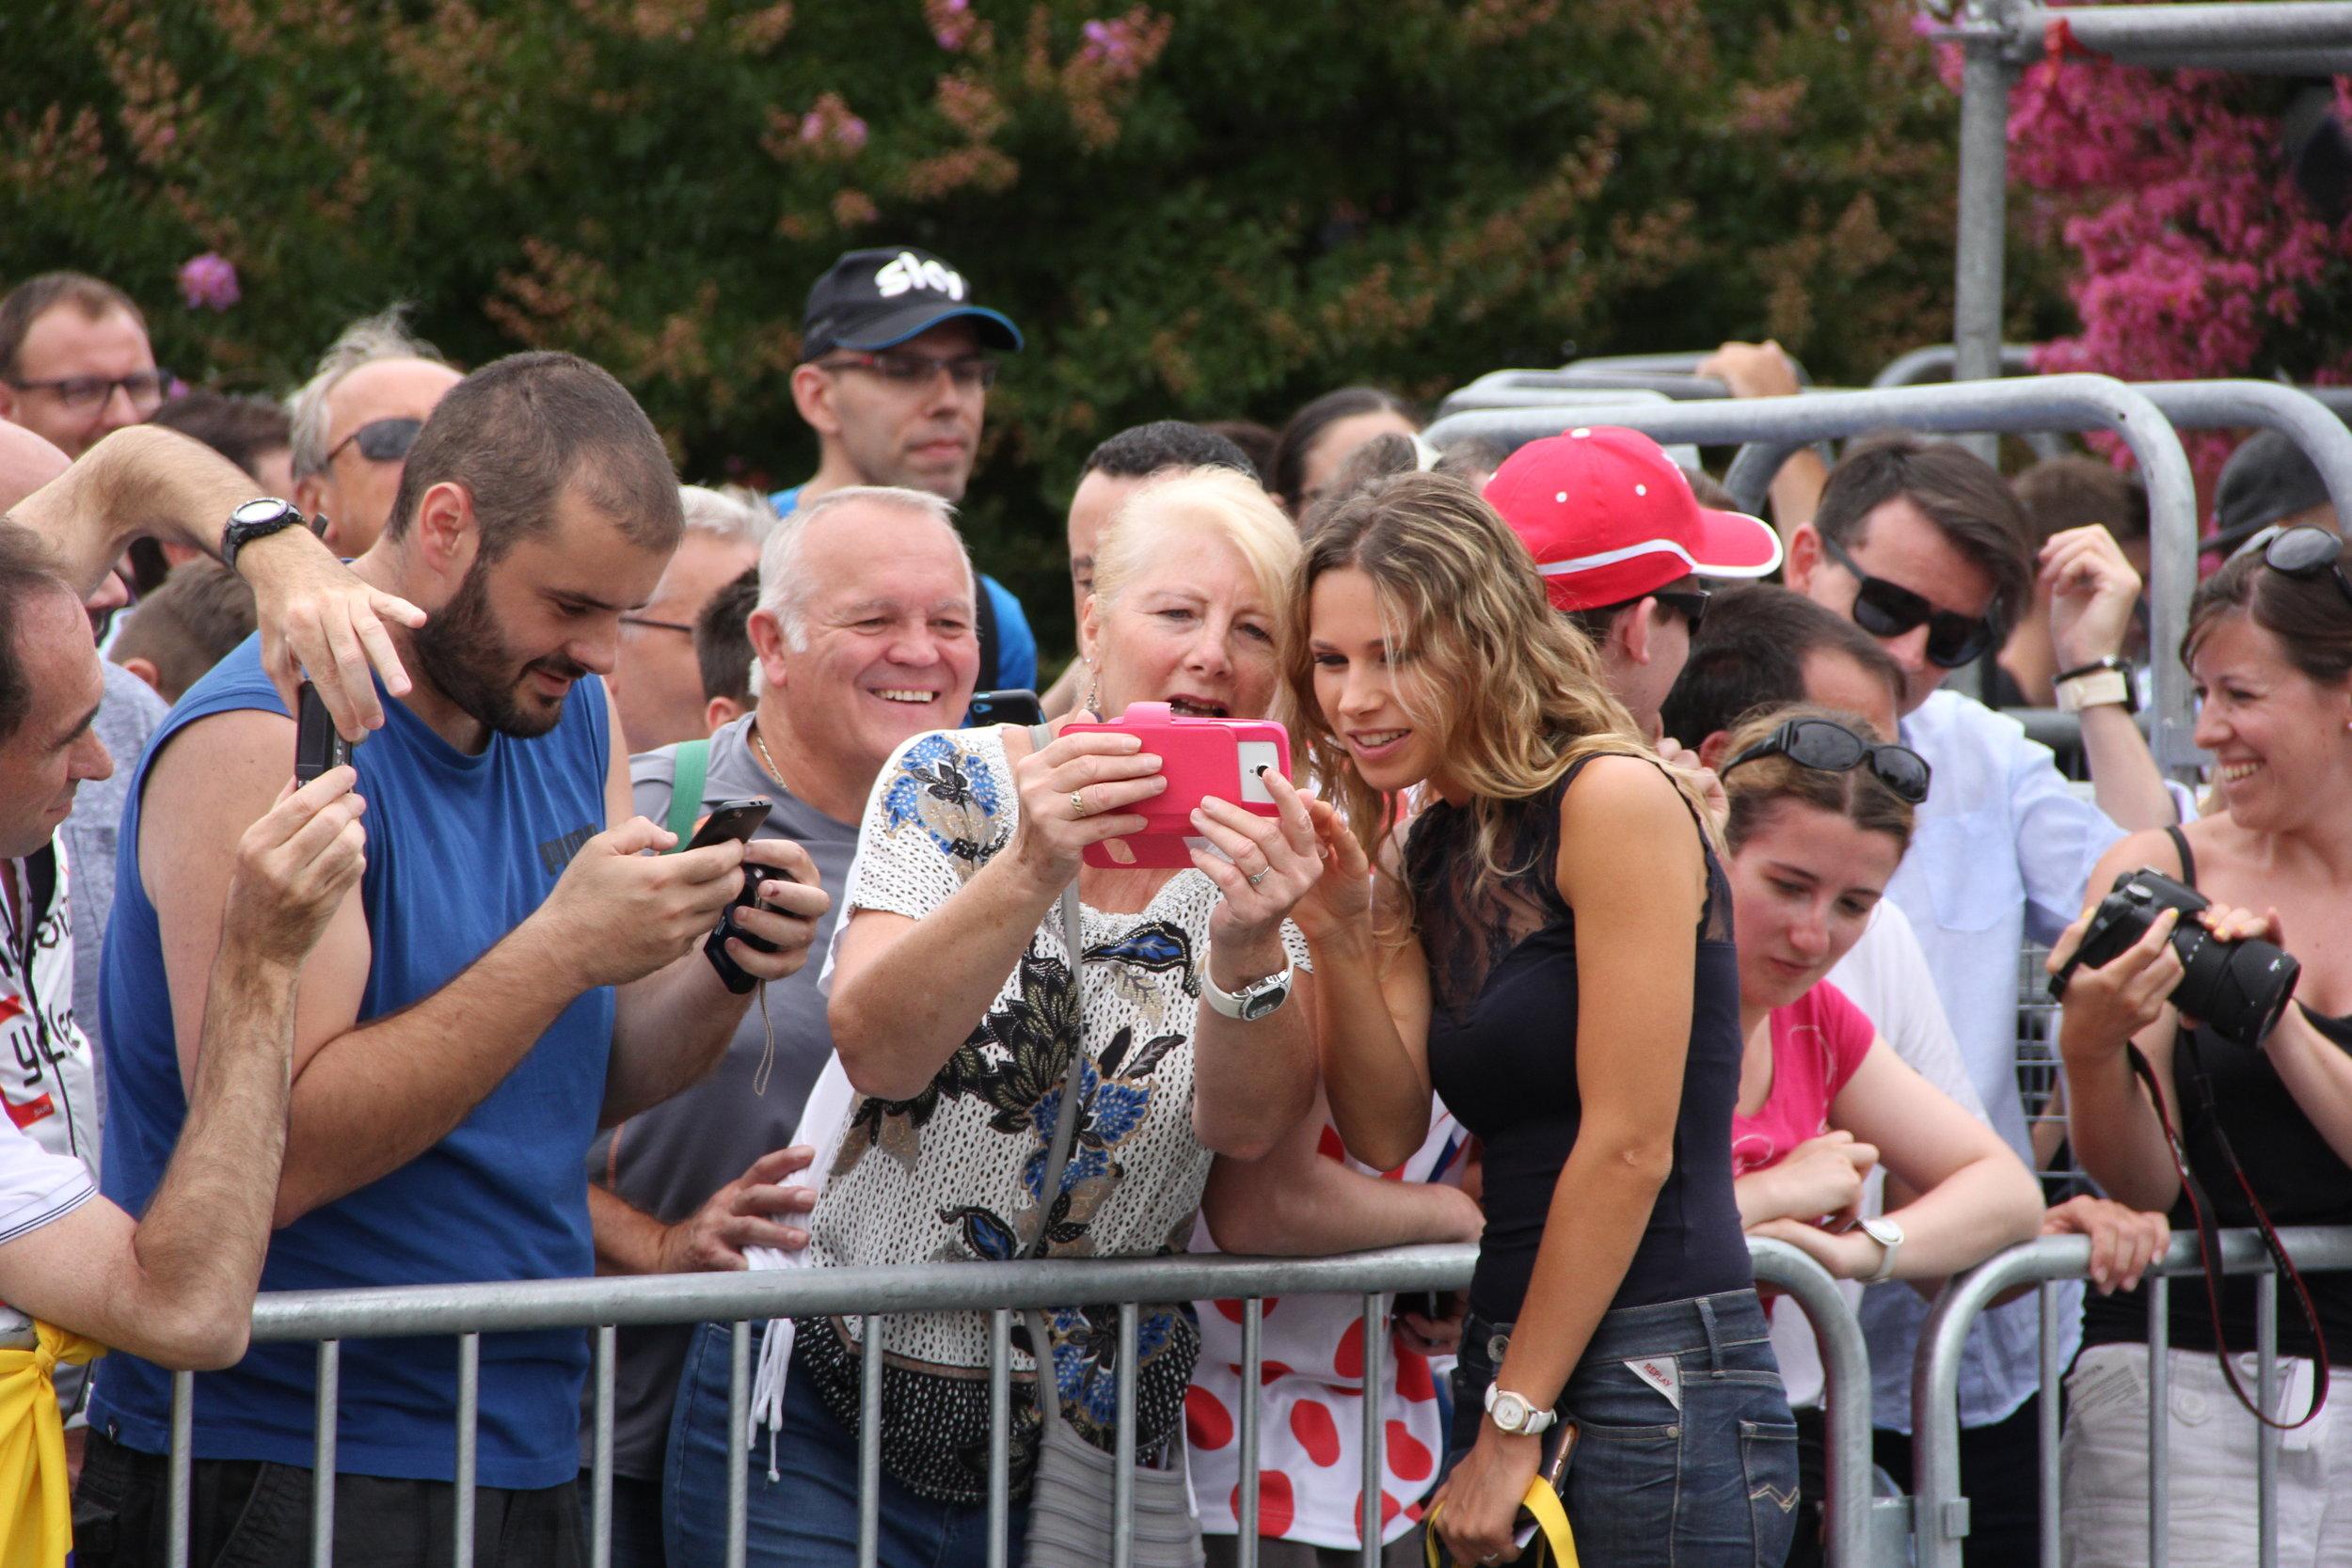 Presenter Laura Meseguer keeps fans happy